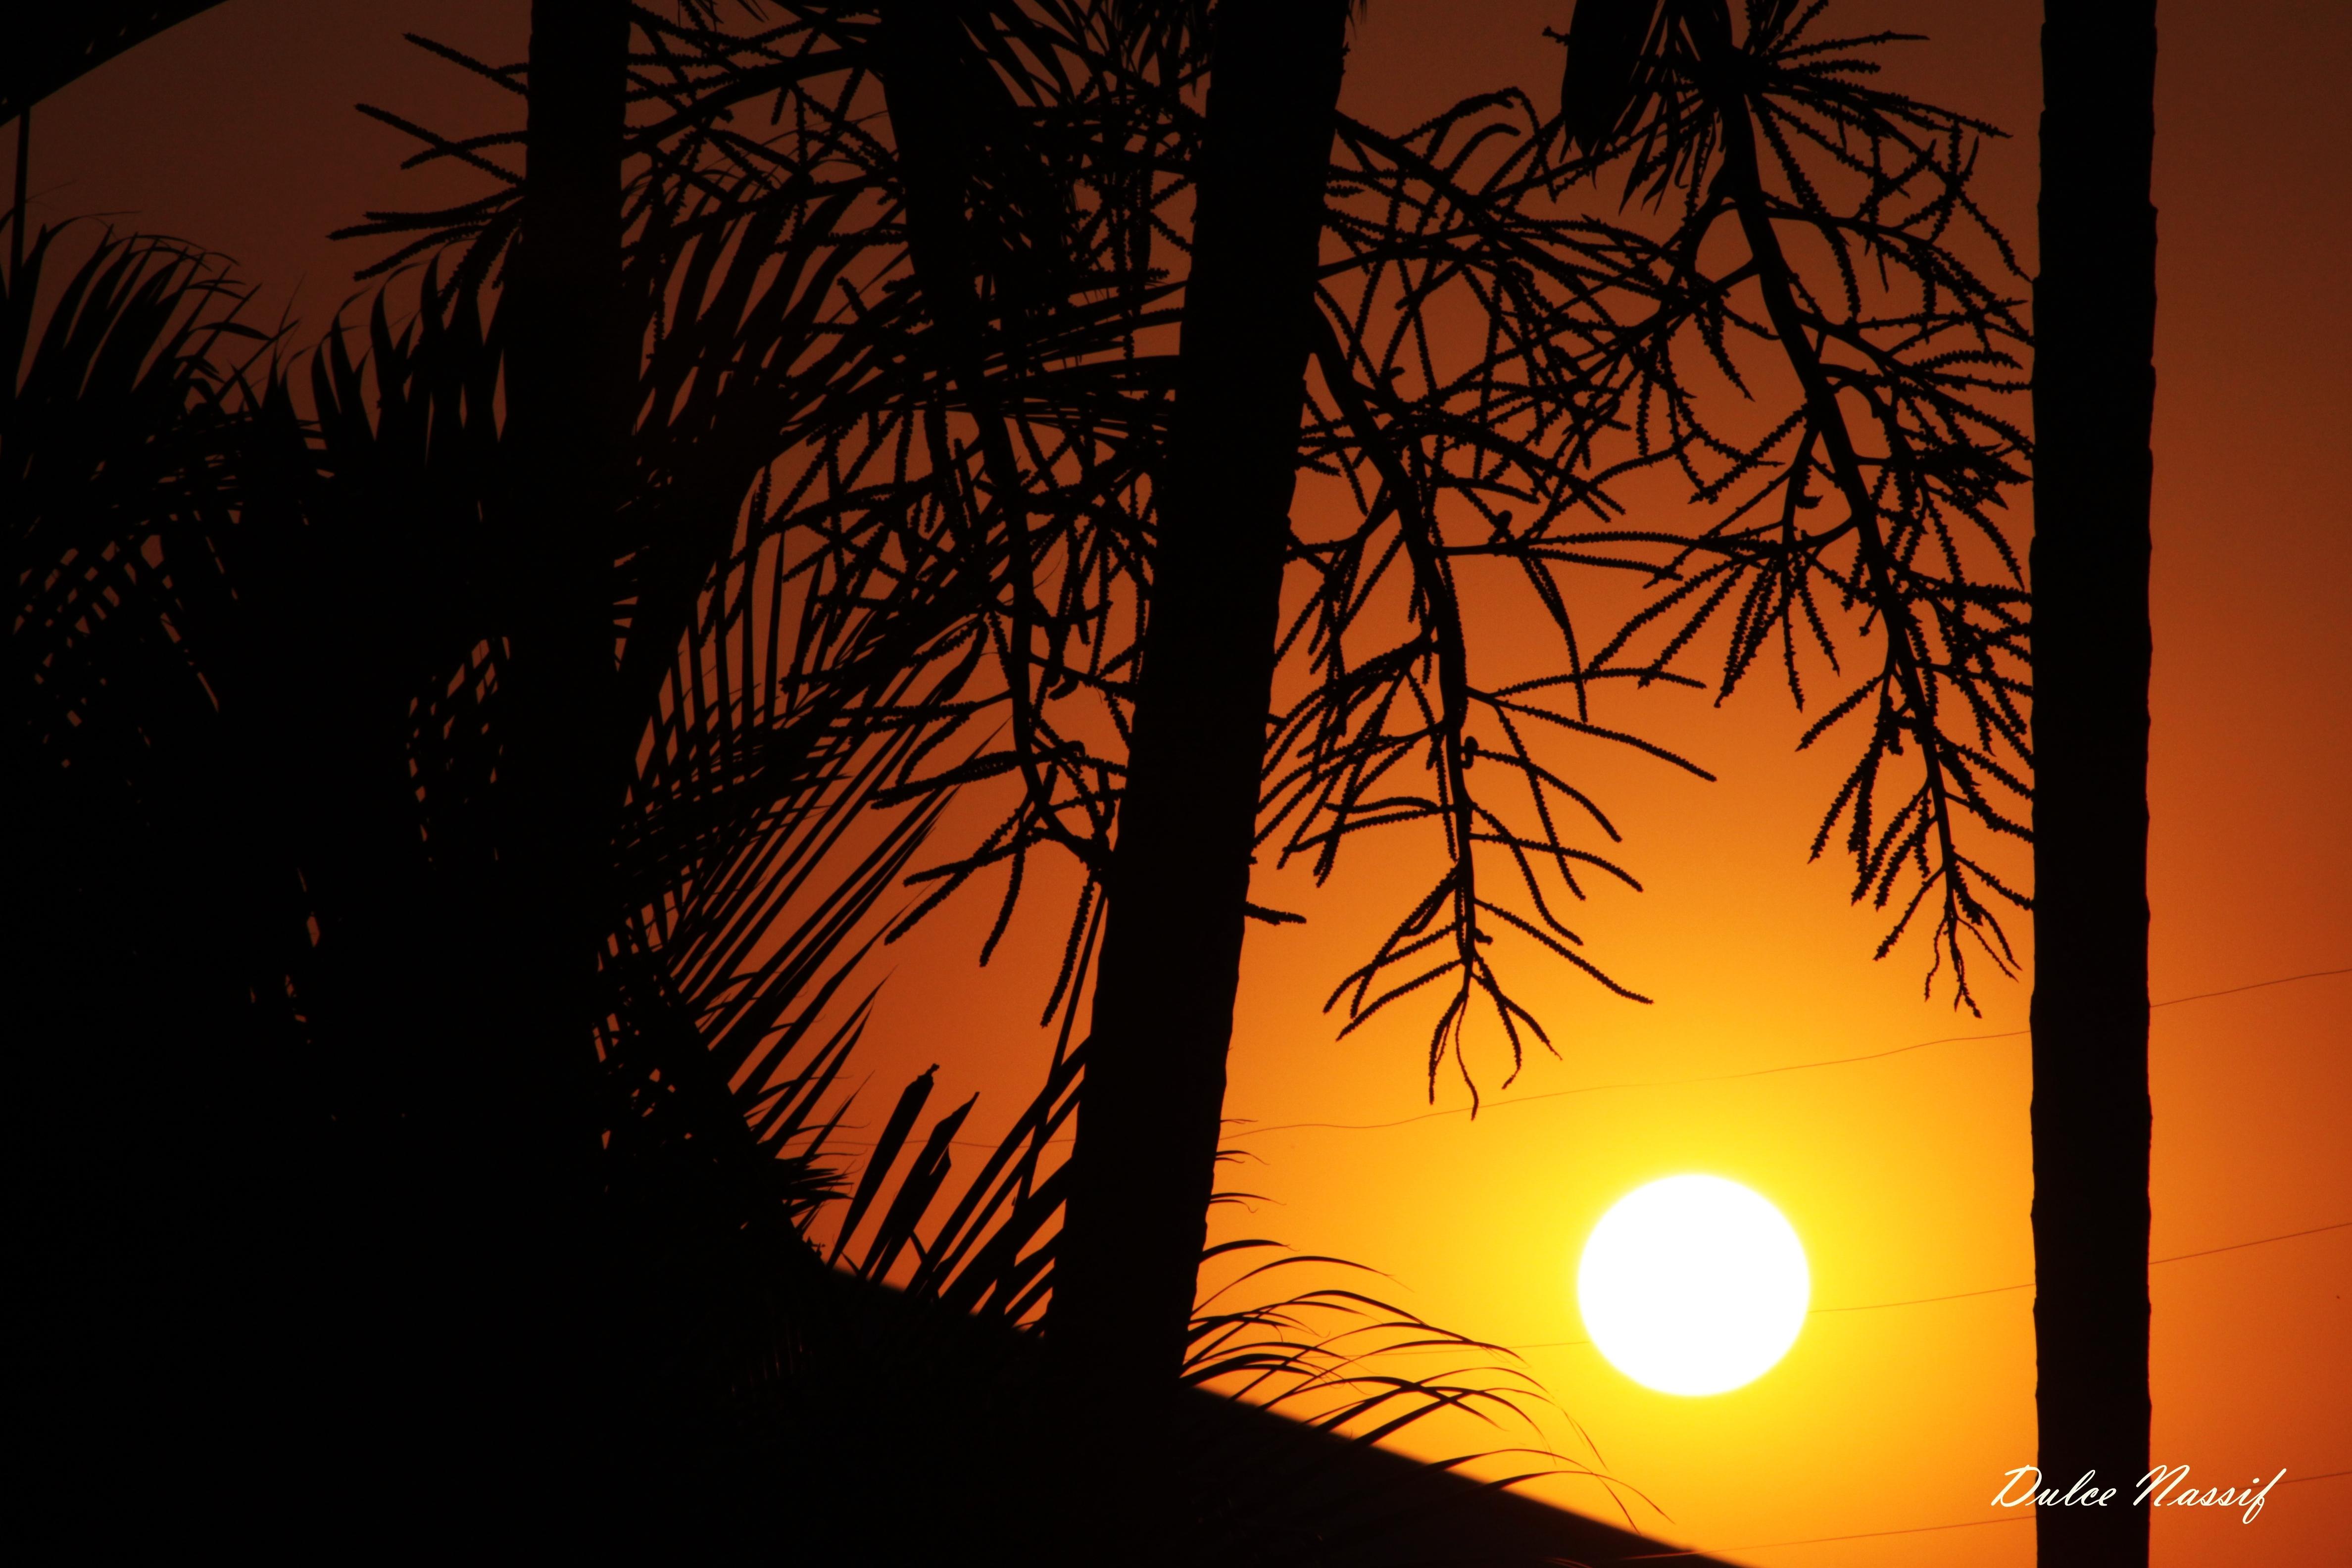 Wallpaper Sunlight Sunset Night Sky Silhouette Branch